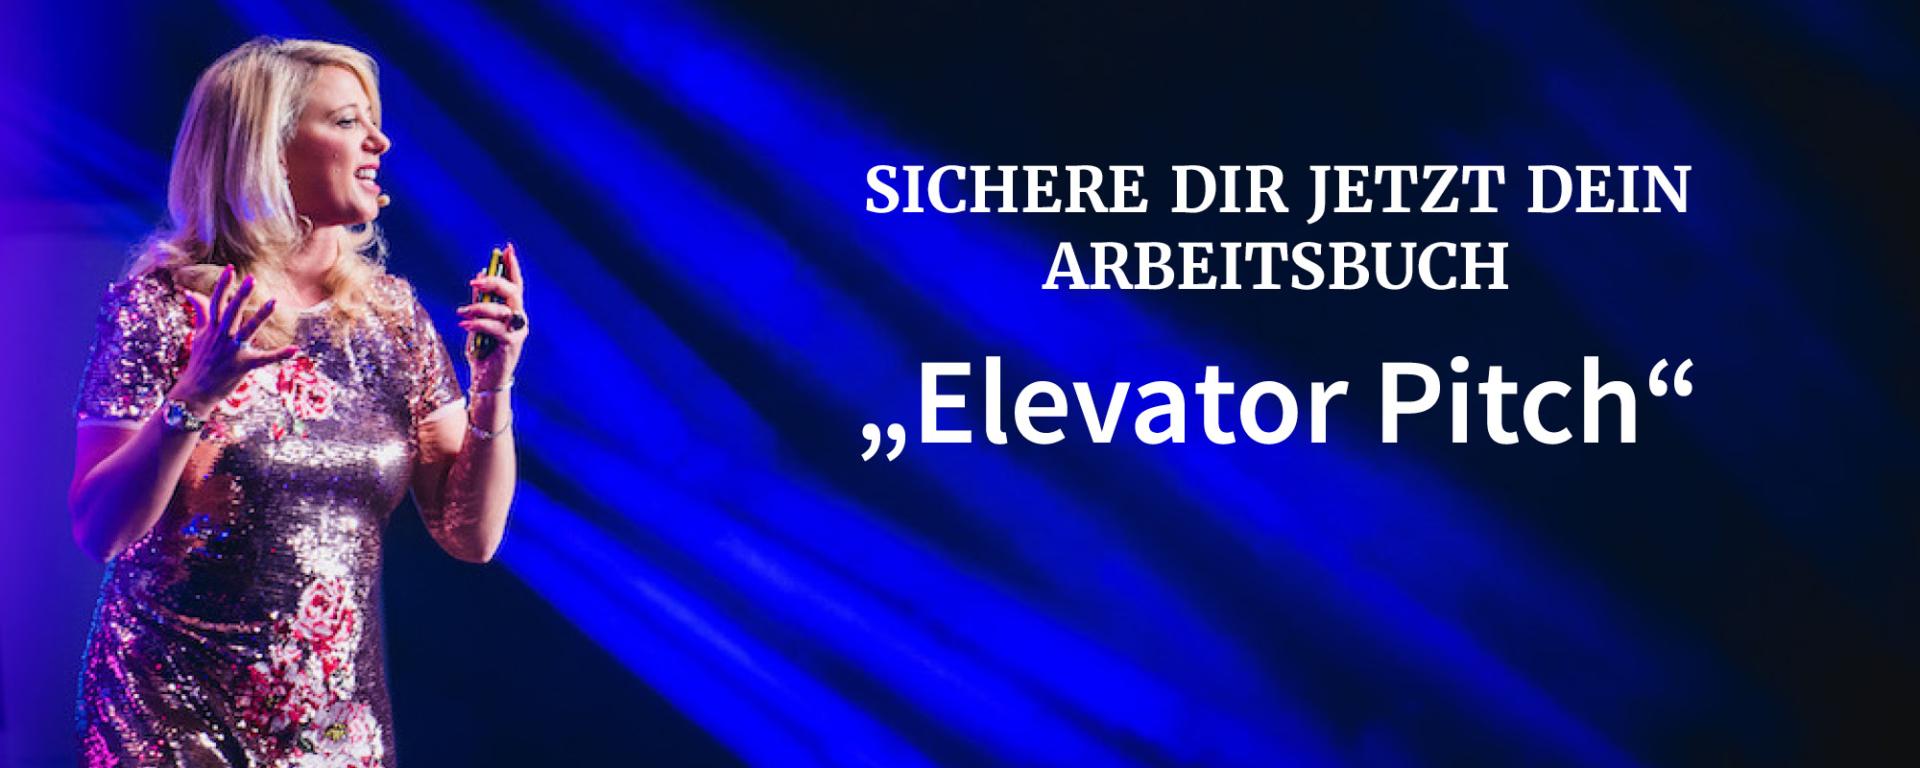 Header_Web_Elevator pitch